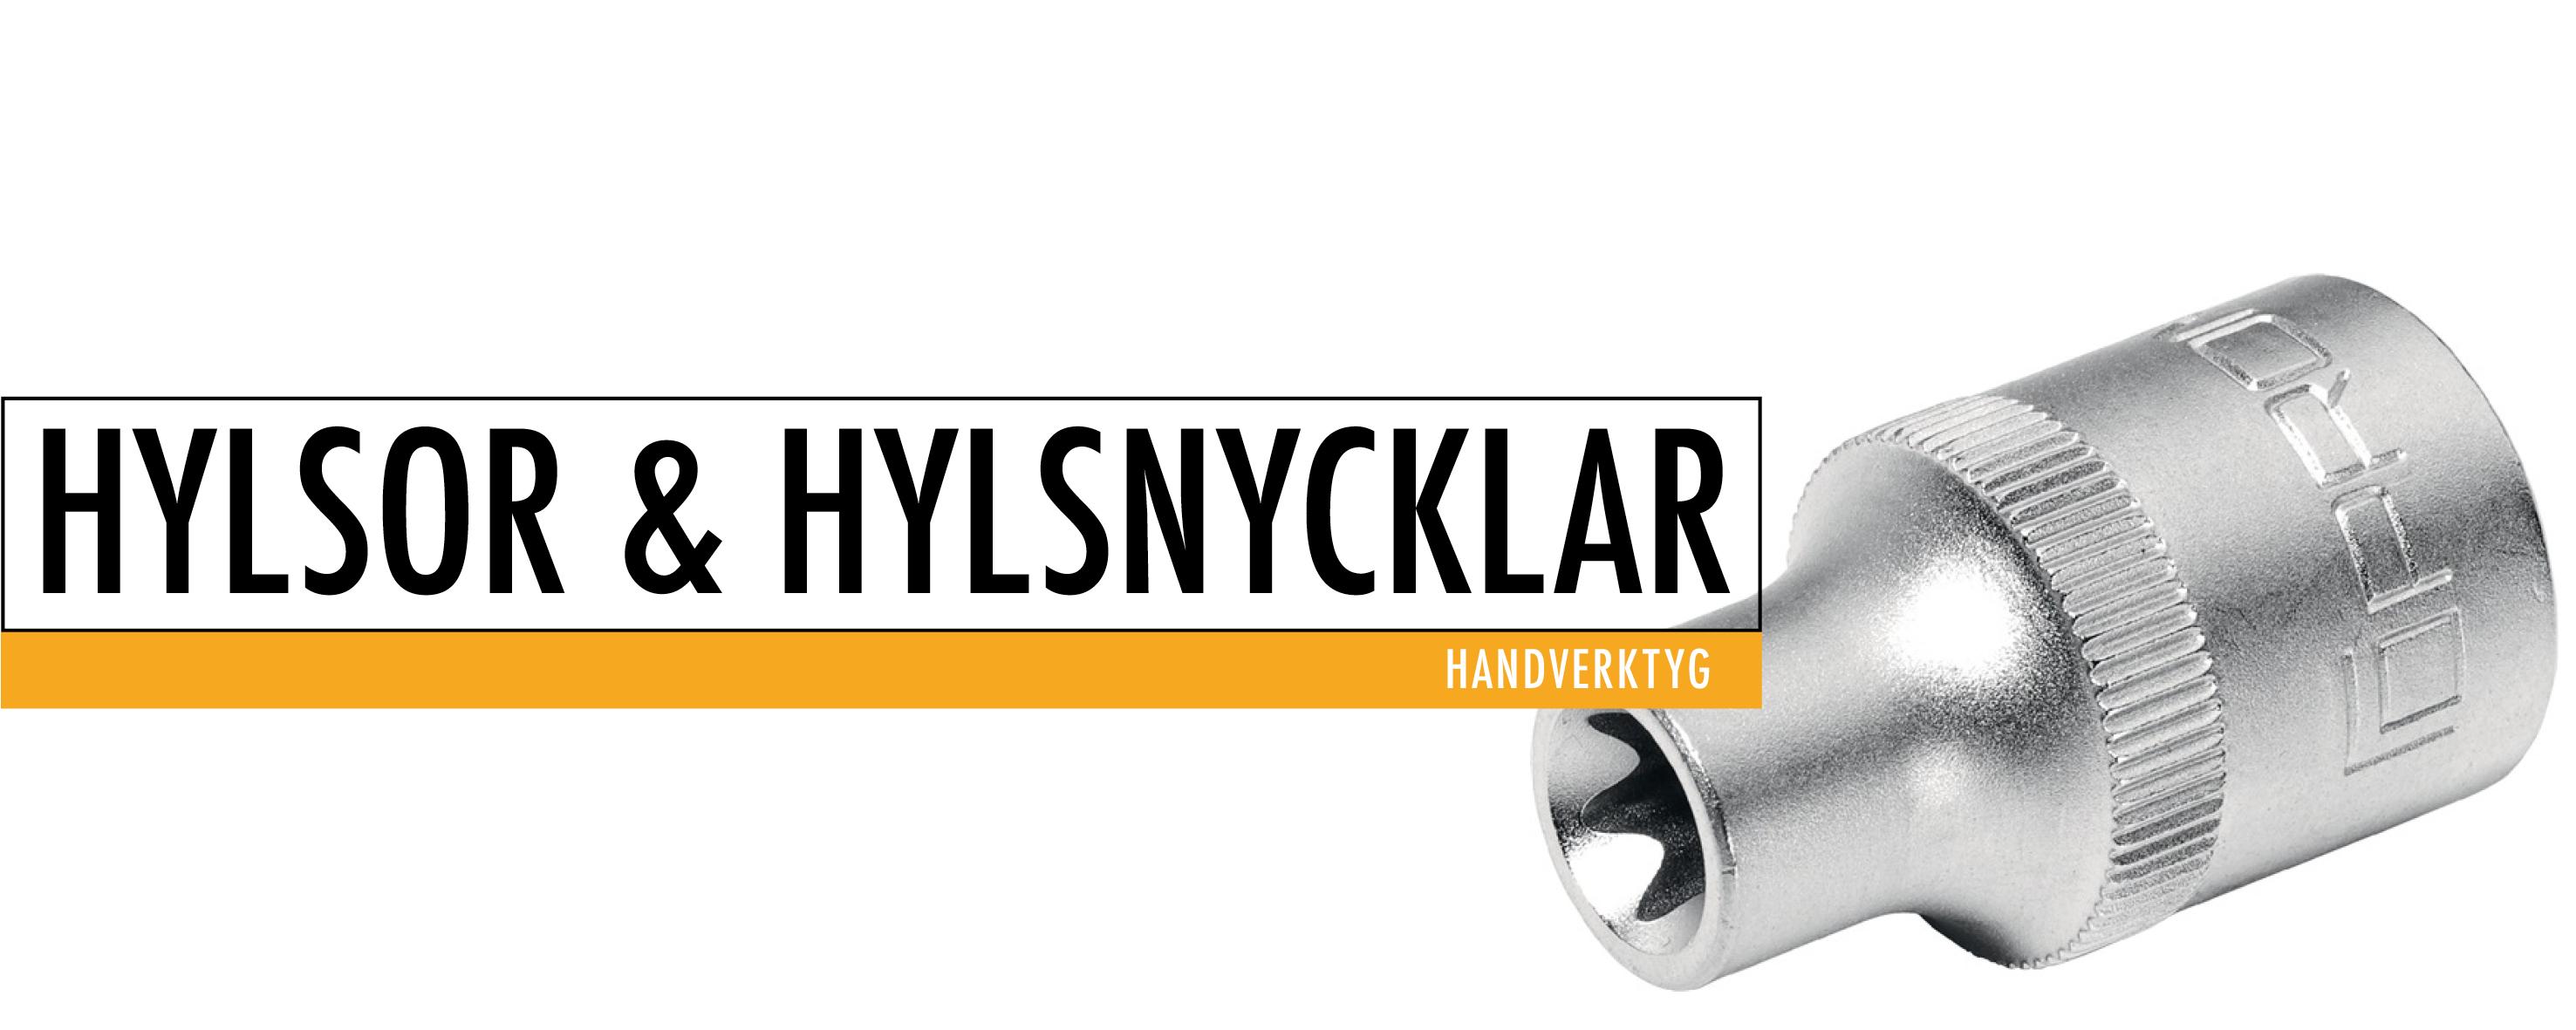 Hylsor & hylsnycklar